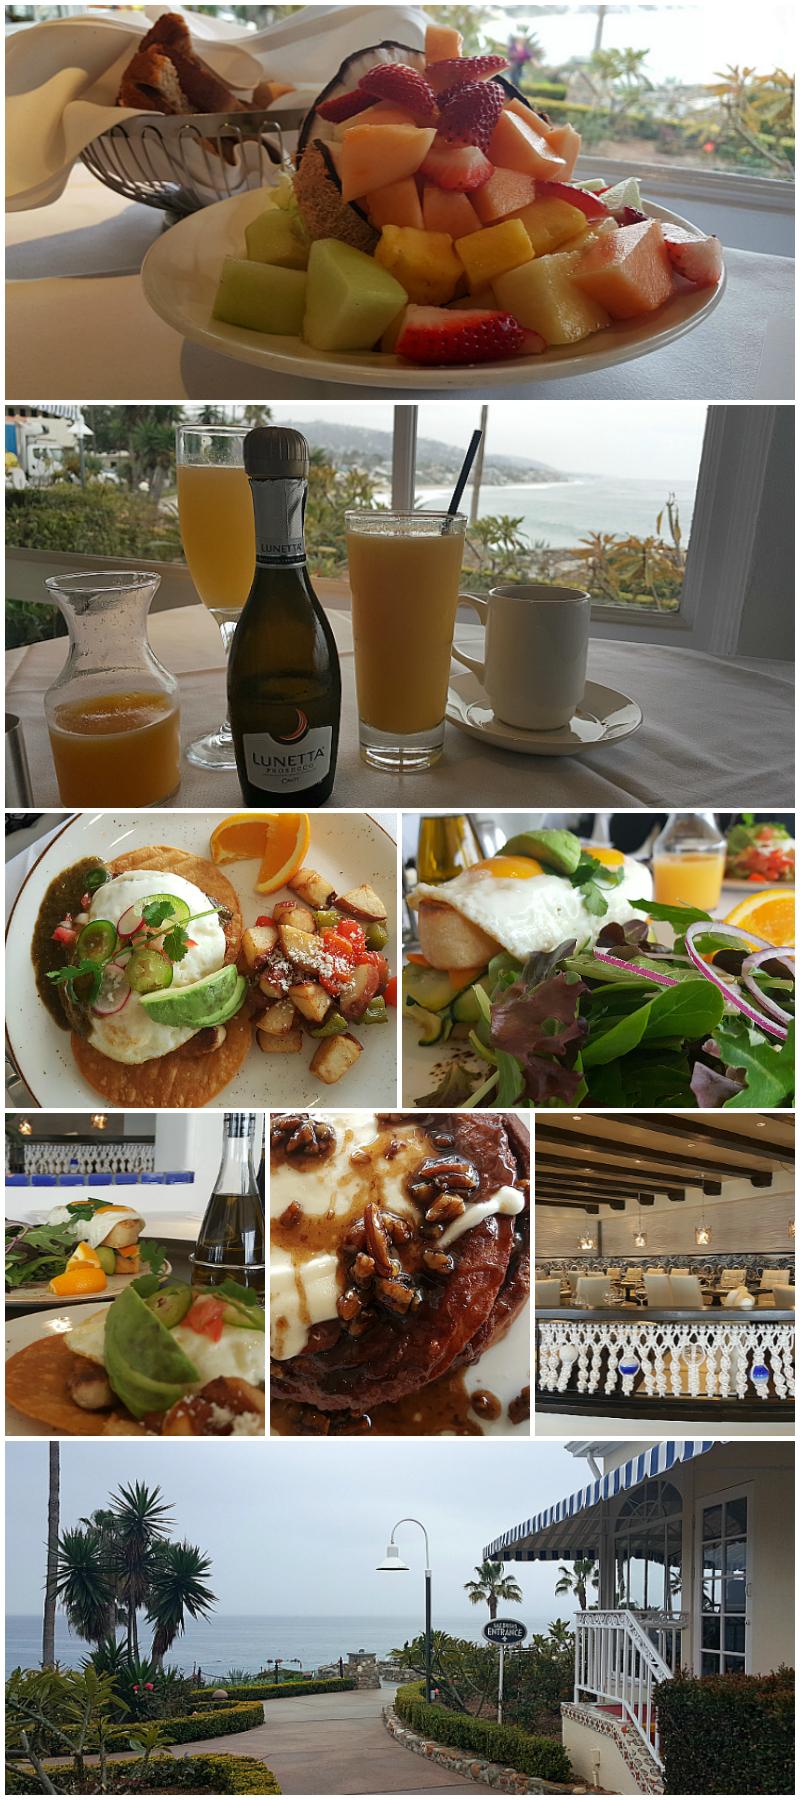 Breakfast at Las Brisas in Laguna Beach